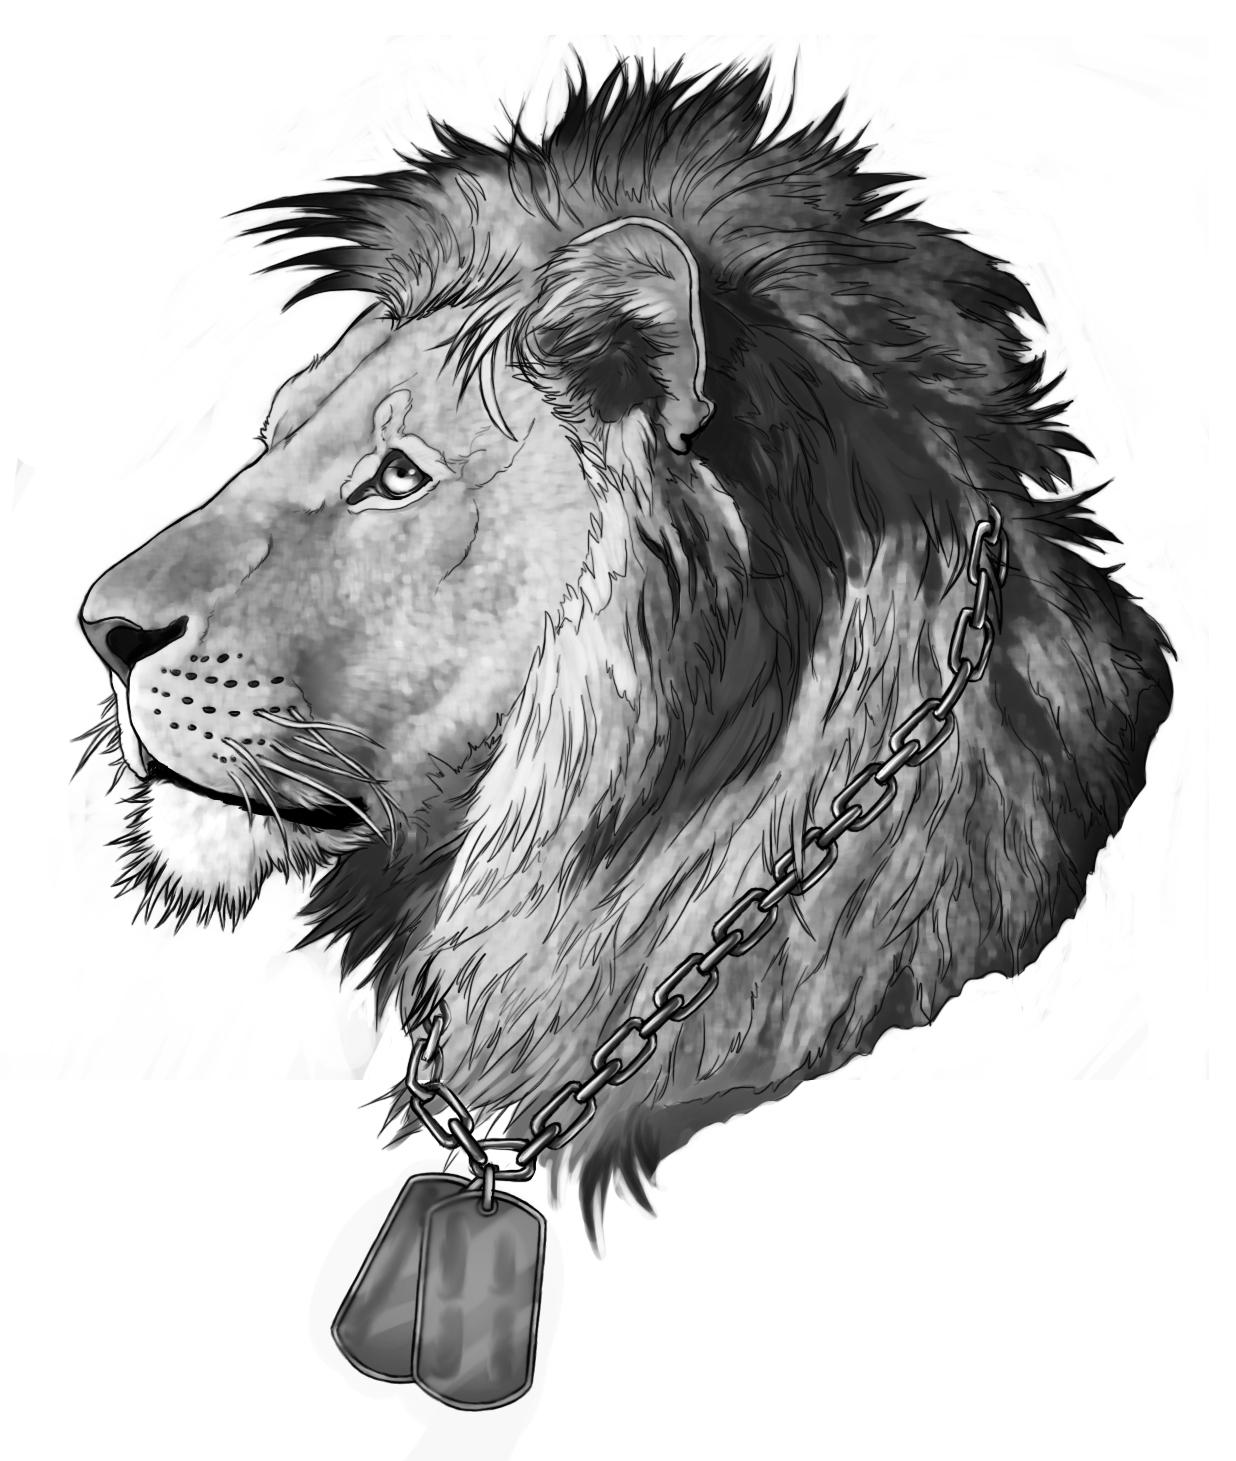 Lion tattoo design by Rogue-Lgr